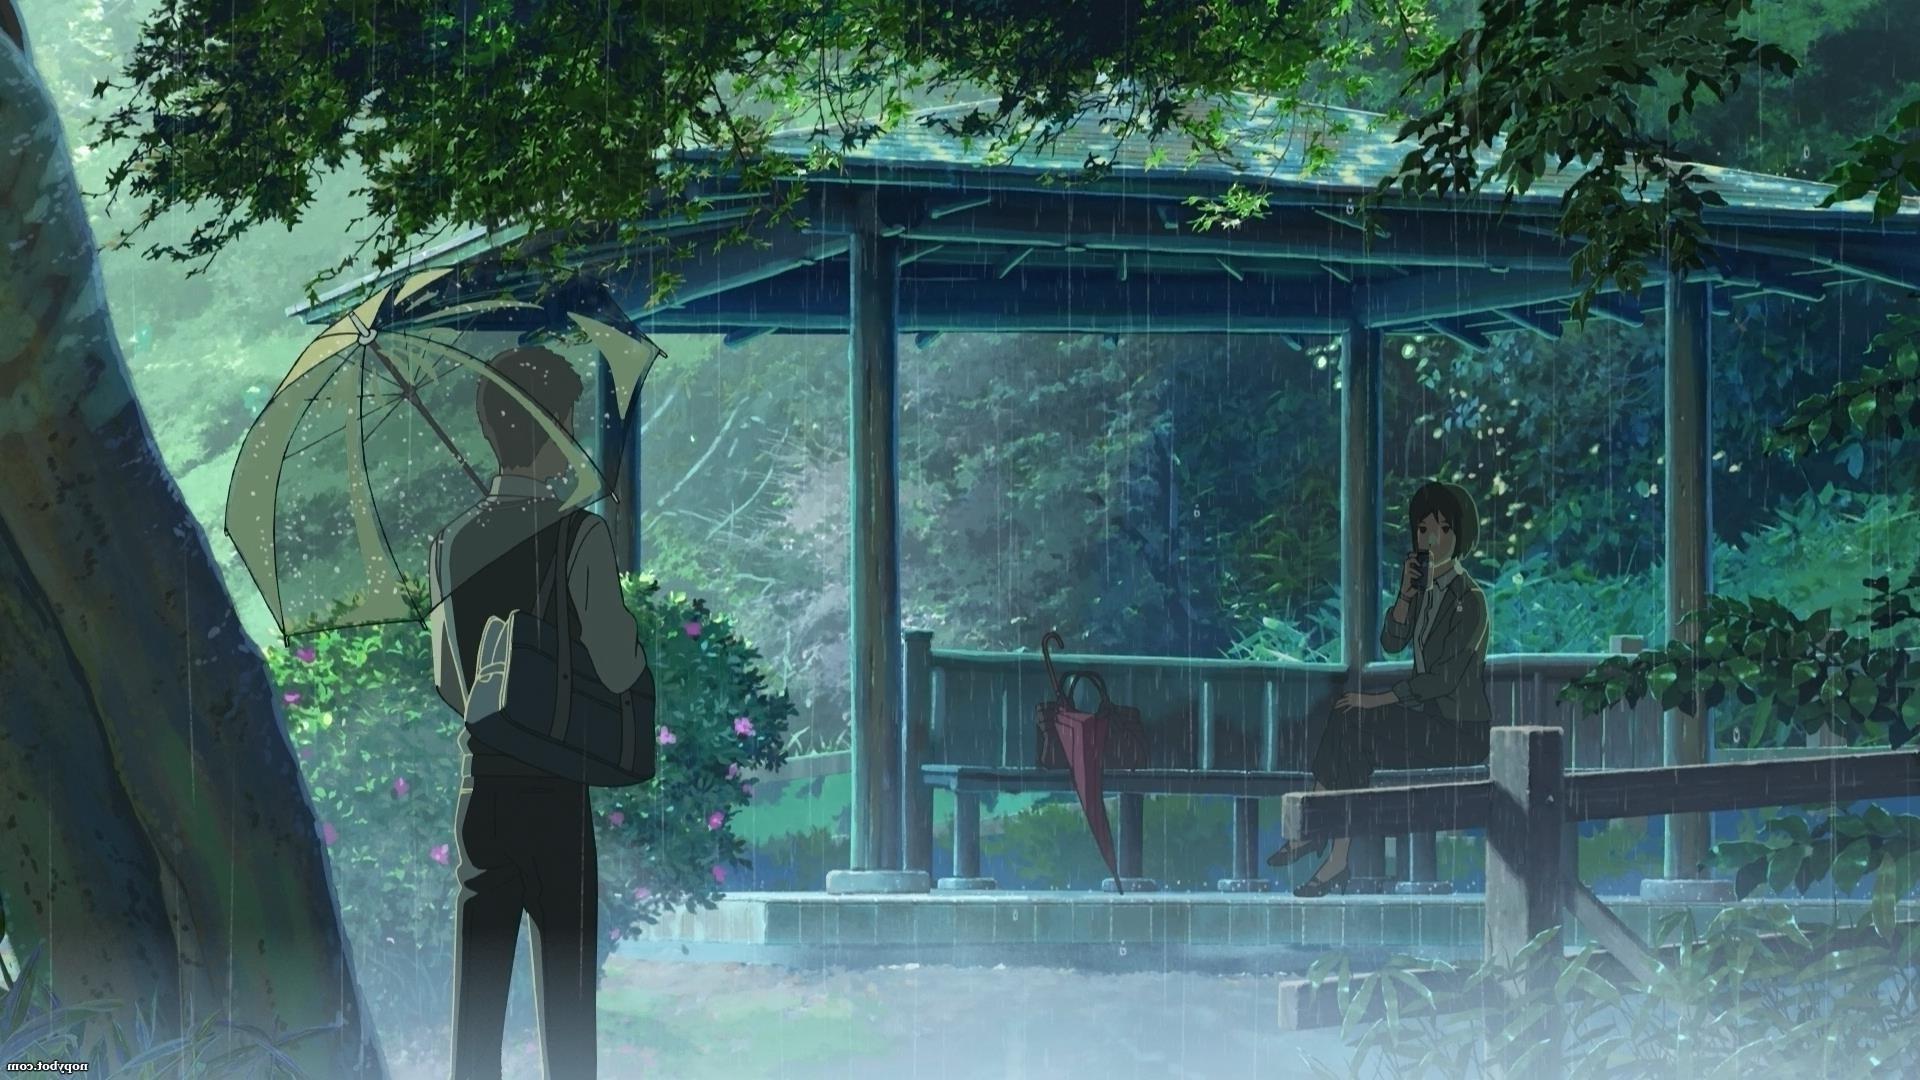 Marvelous Rain The Garden Of Words Jungle Makoto Shinkai 1920x1080 Px